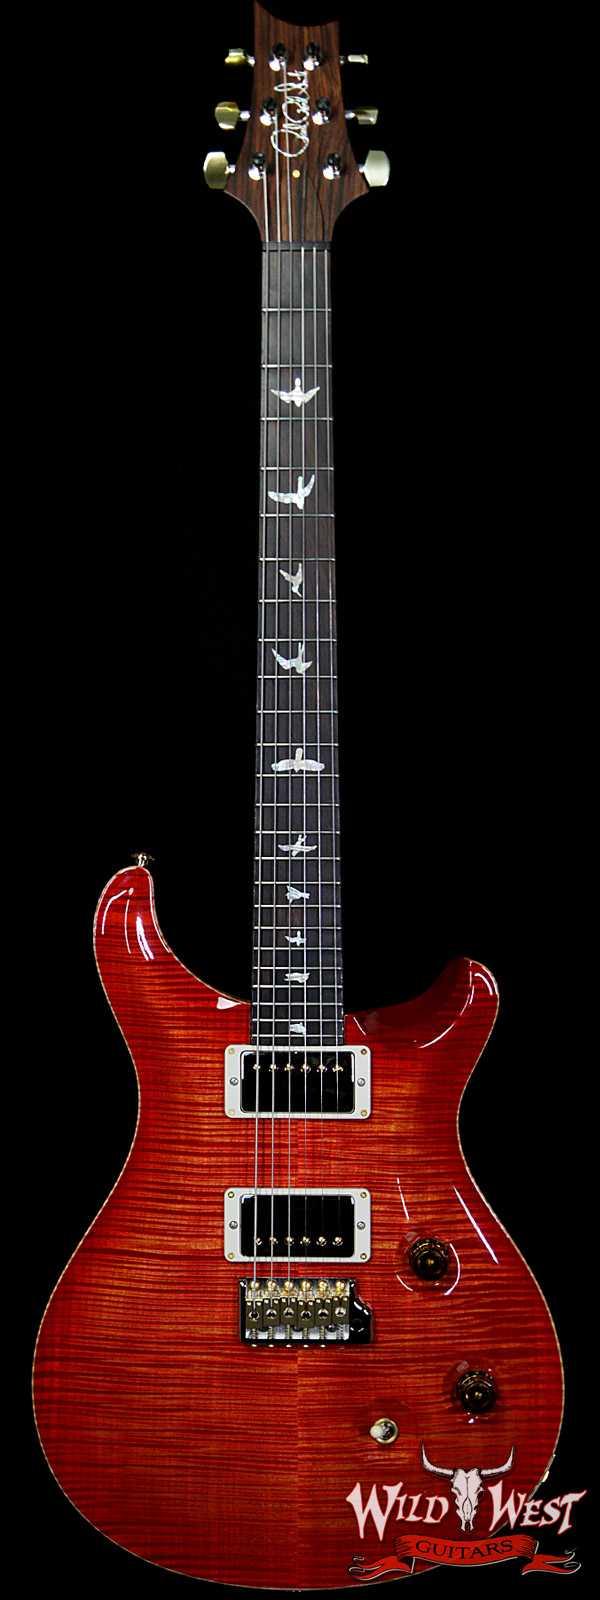 PRS Wild West Guitars 20th Anniversary Limited Run # 36 of 40 Wood Library Artist Package Custom 24 Brazilian Rosewood Fingerboard Blood Orange